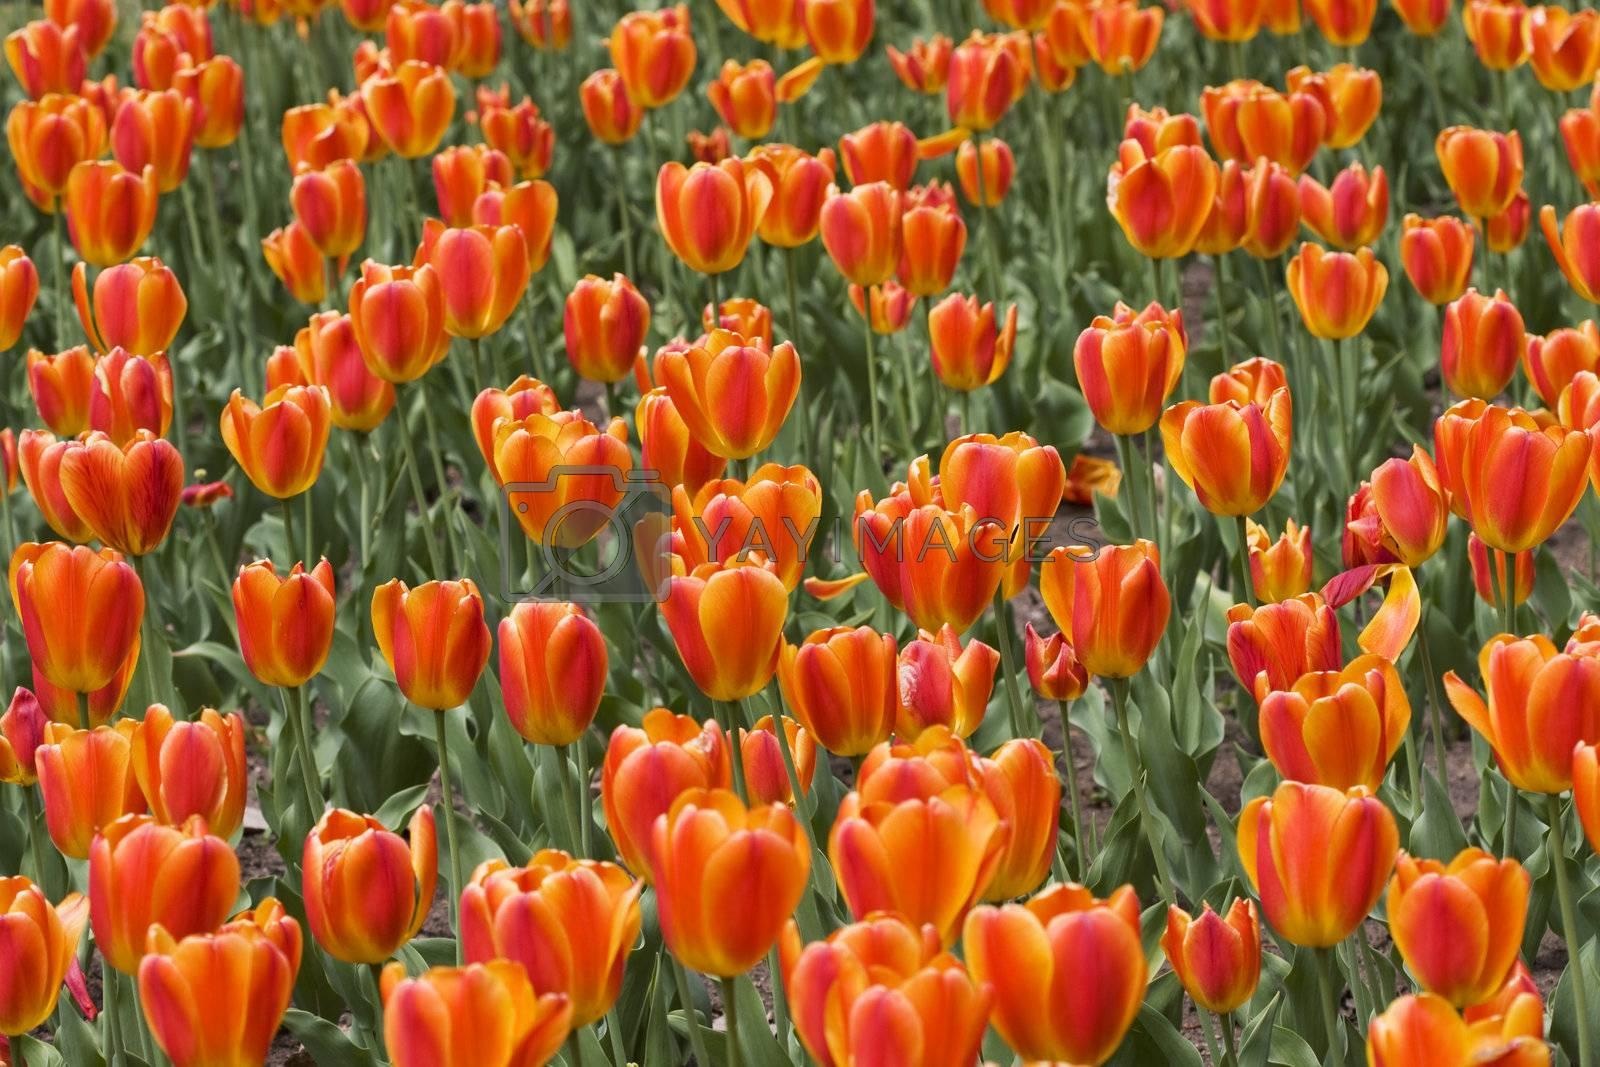 Beautiful orange tulips in a garden in springtime